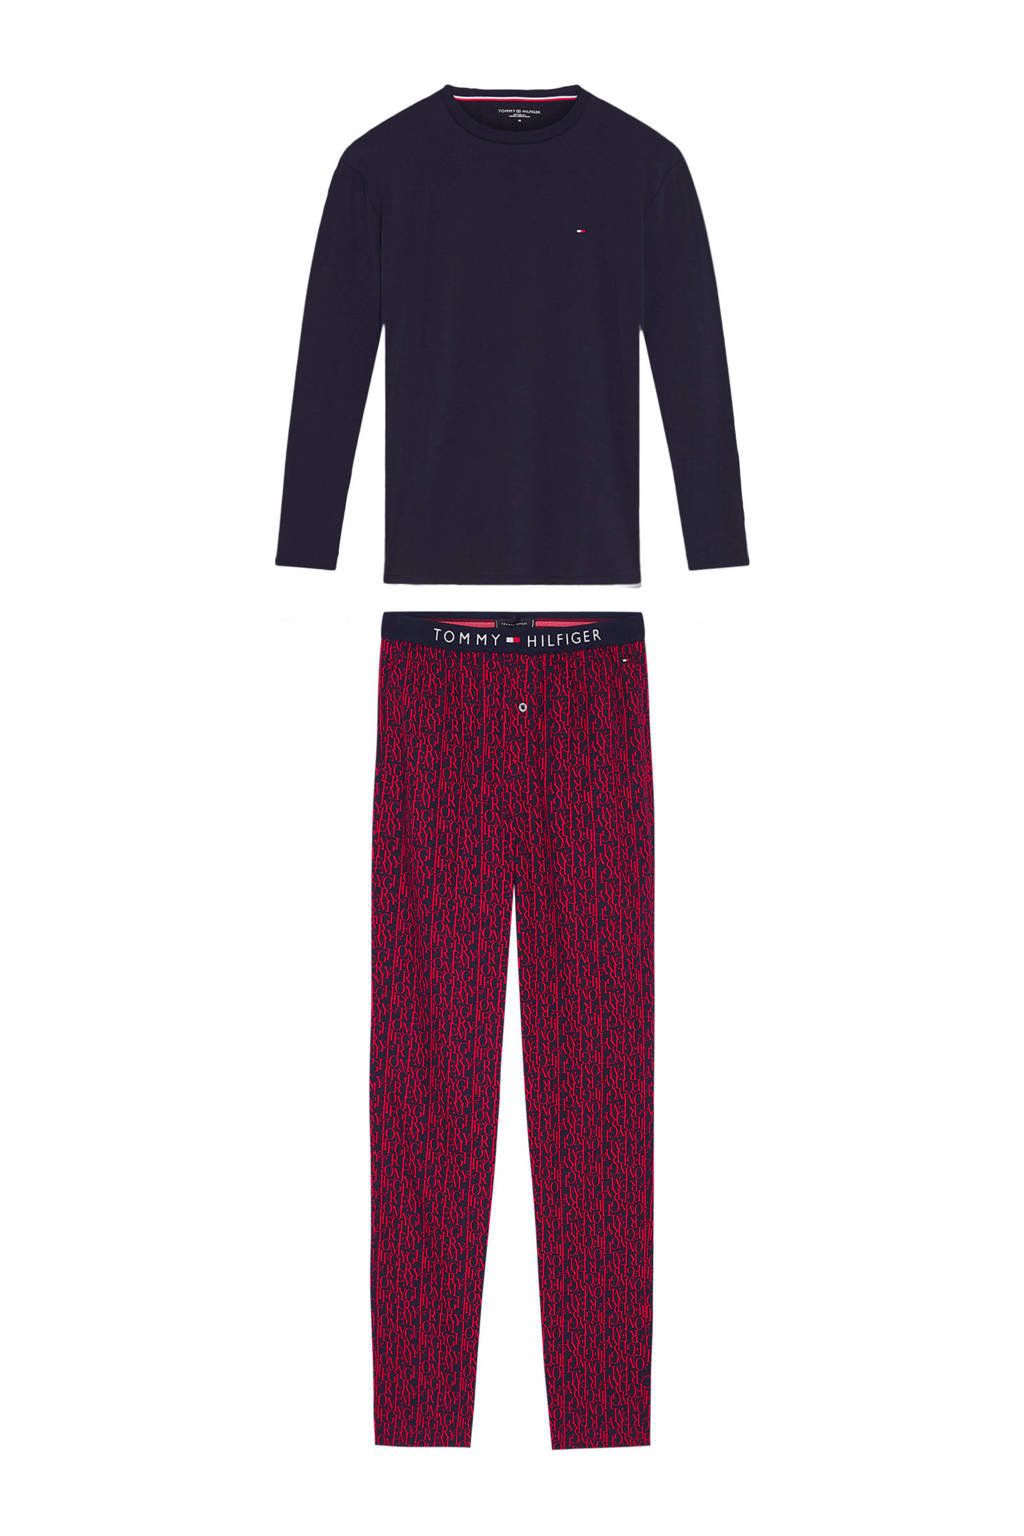 Tommy Hilfiger pyjama donkerblauw/rood, Donkerblauw/rood